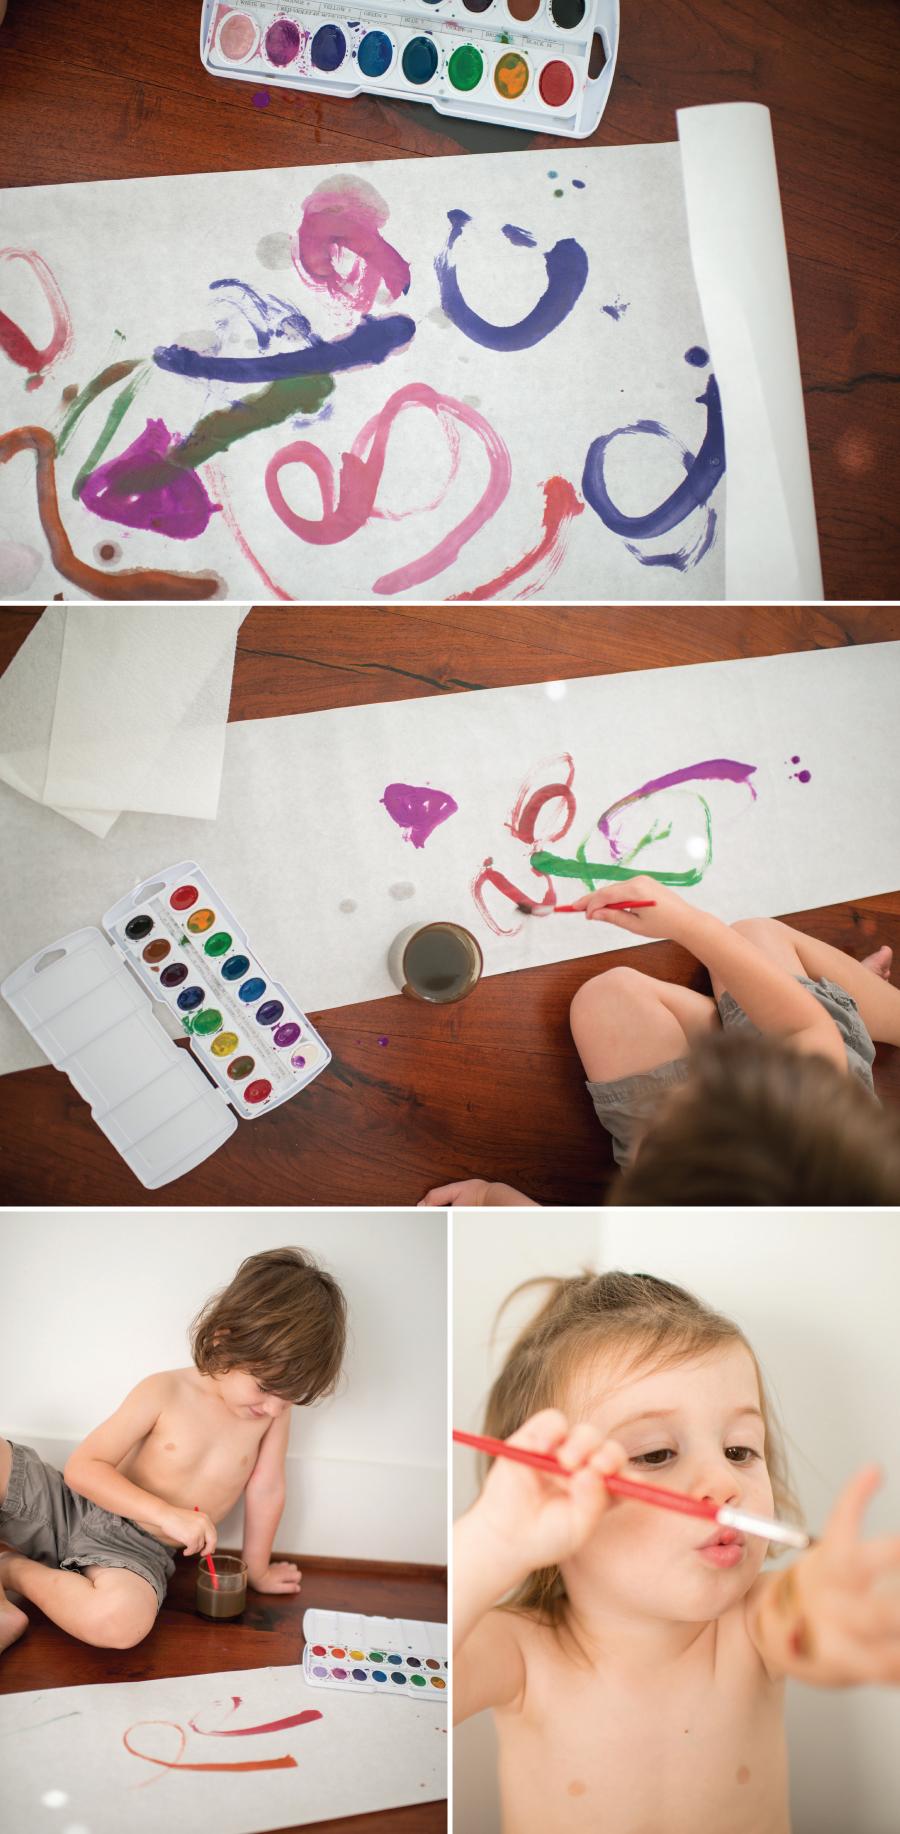 Jill-Smith-painting-01